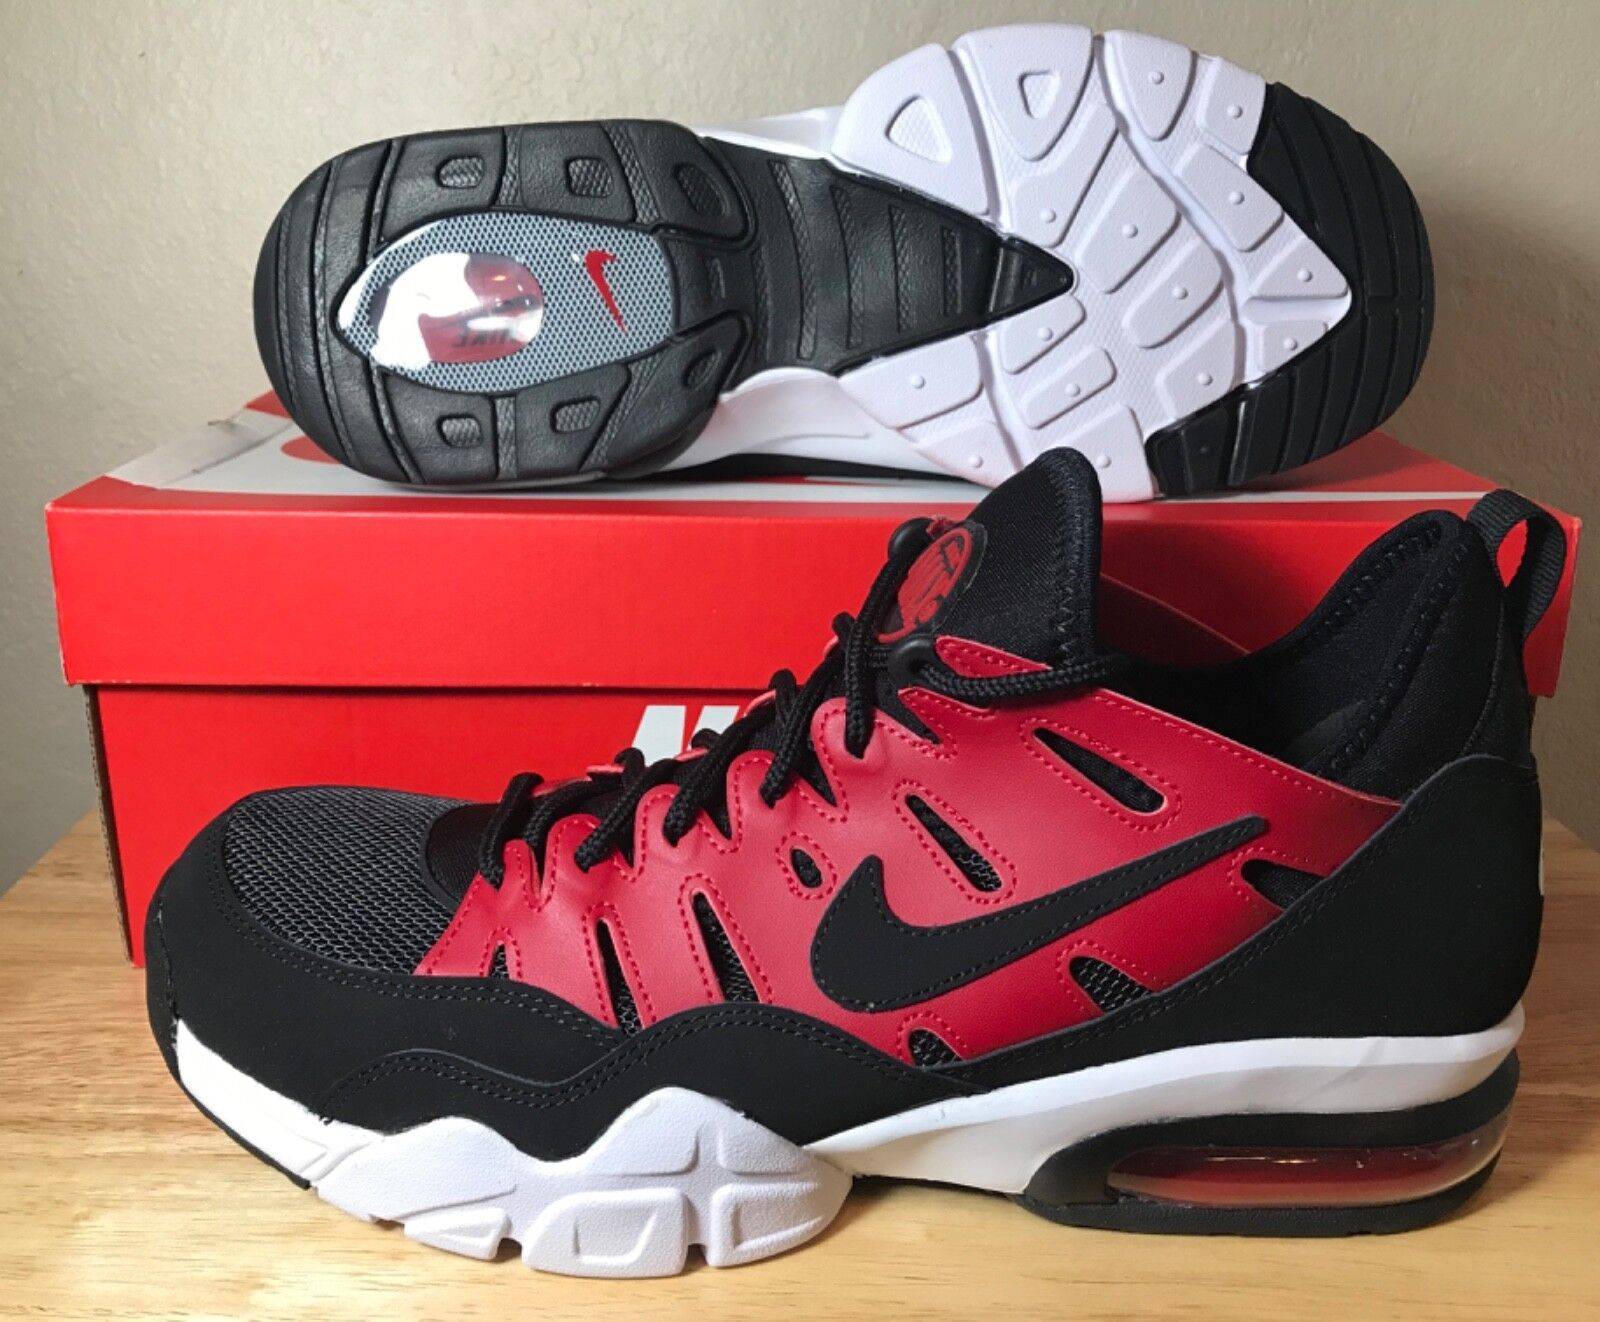 Nike Air Trainer Max 94 Low SZ Mens Gym Red Black White Training New 880995-600